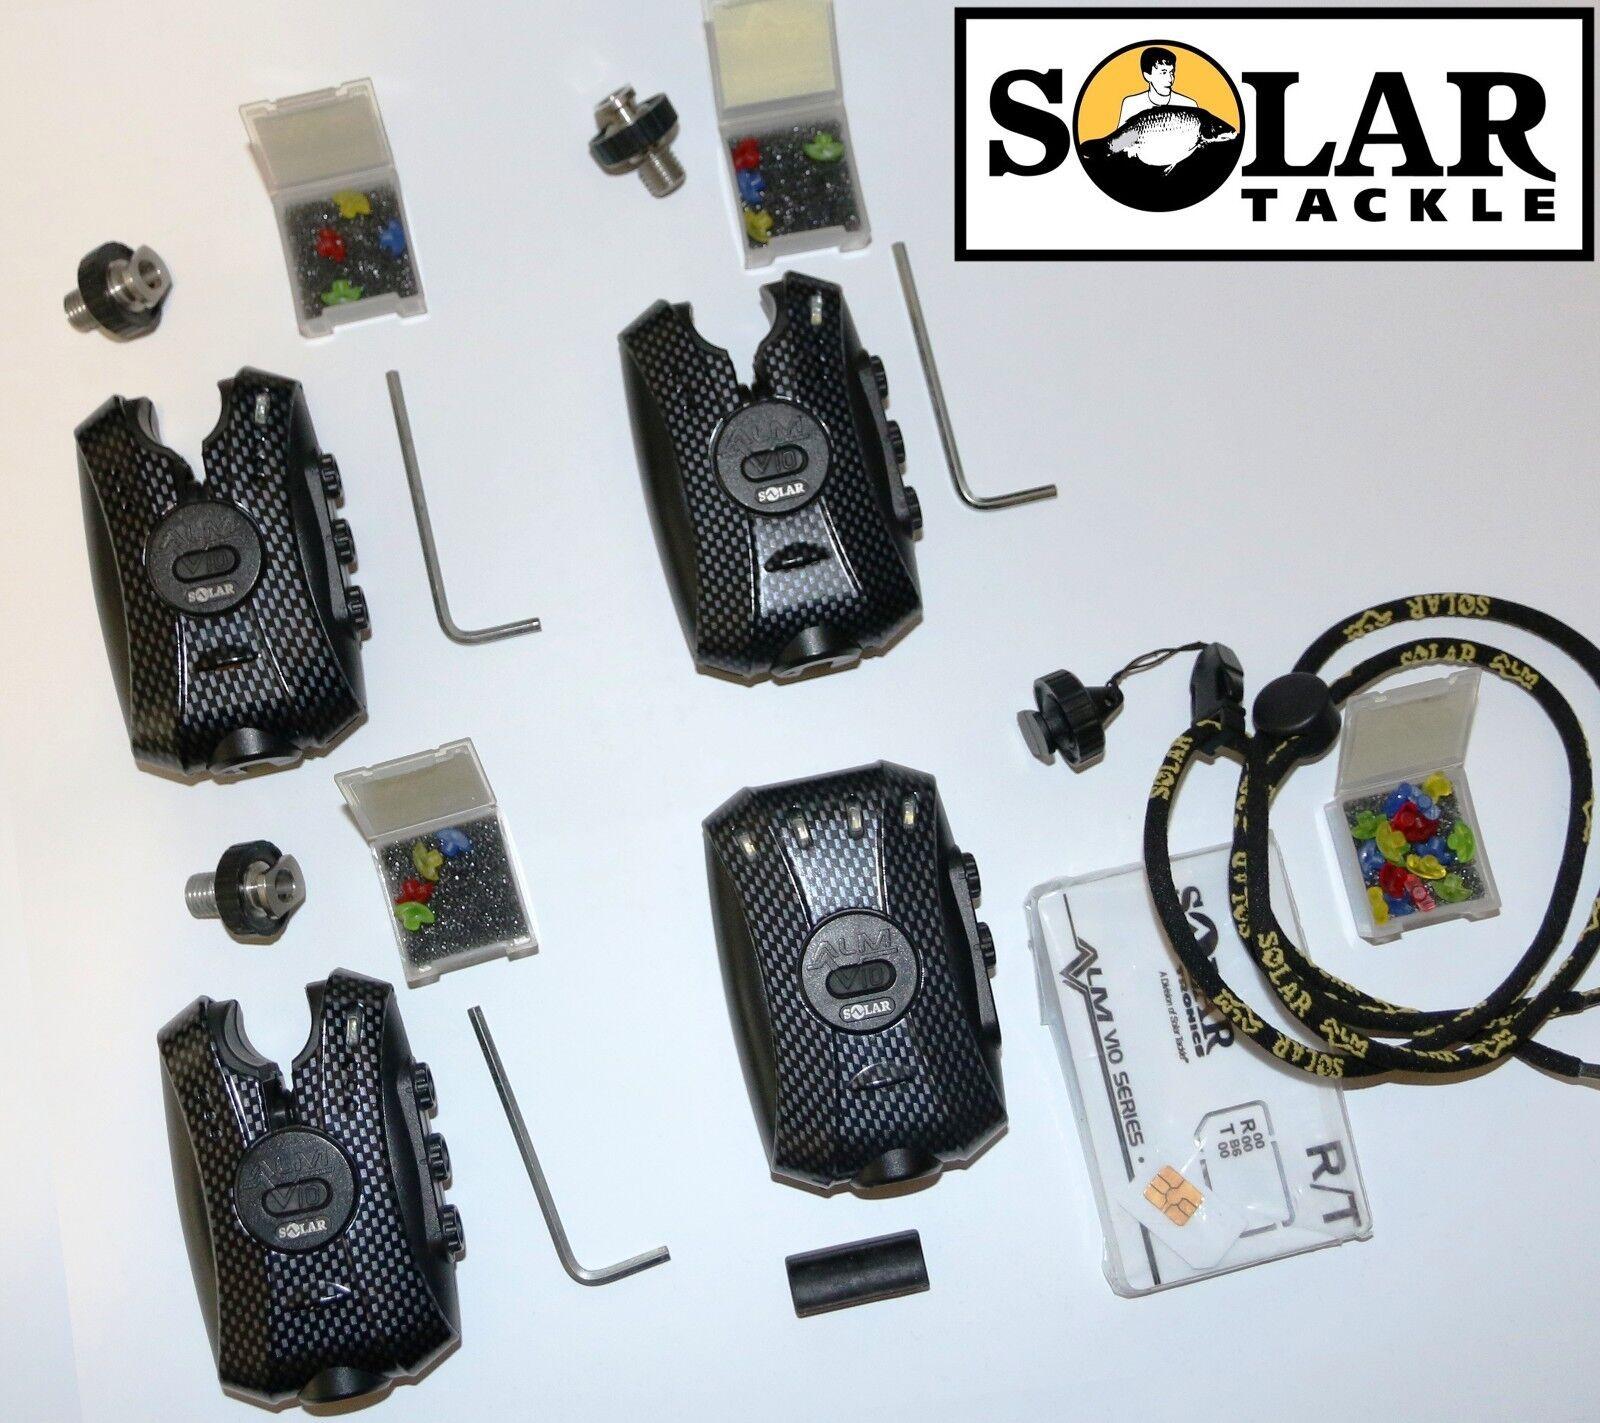 Solar alm v10 sistema de radio 3+1 v10i funkbissanzeiger funkreceiver v10t box Cochebon